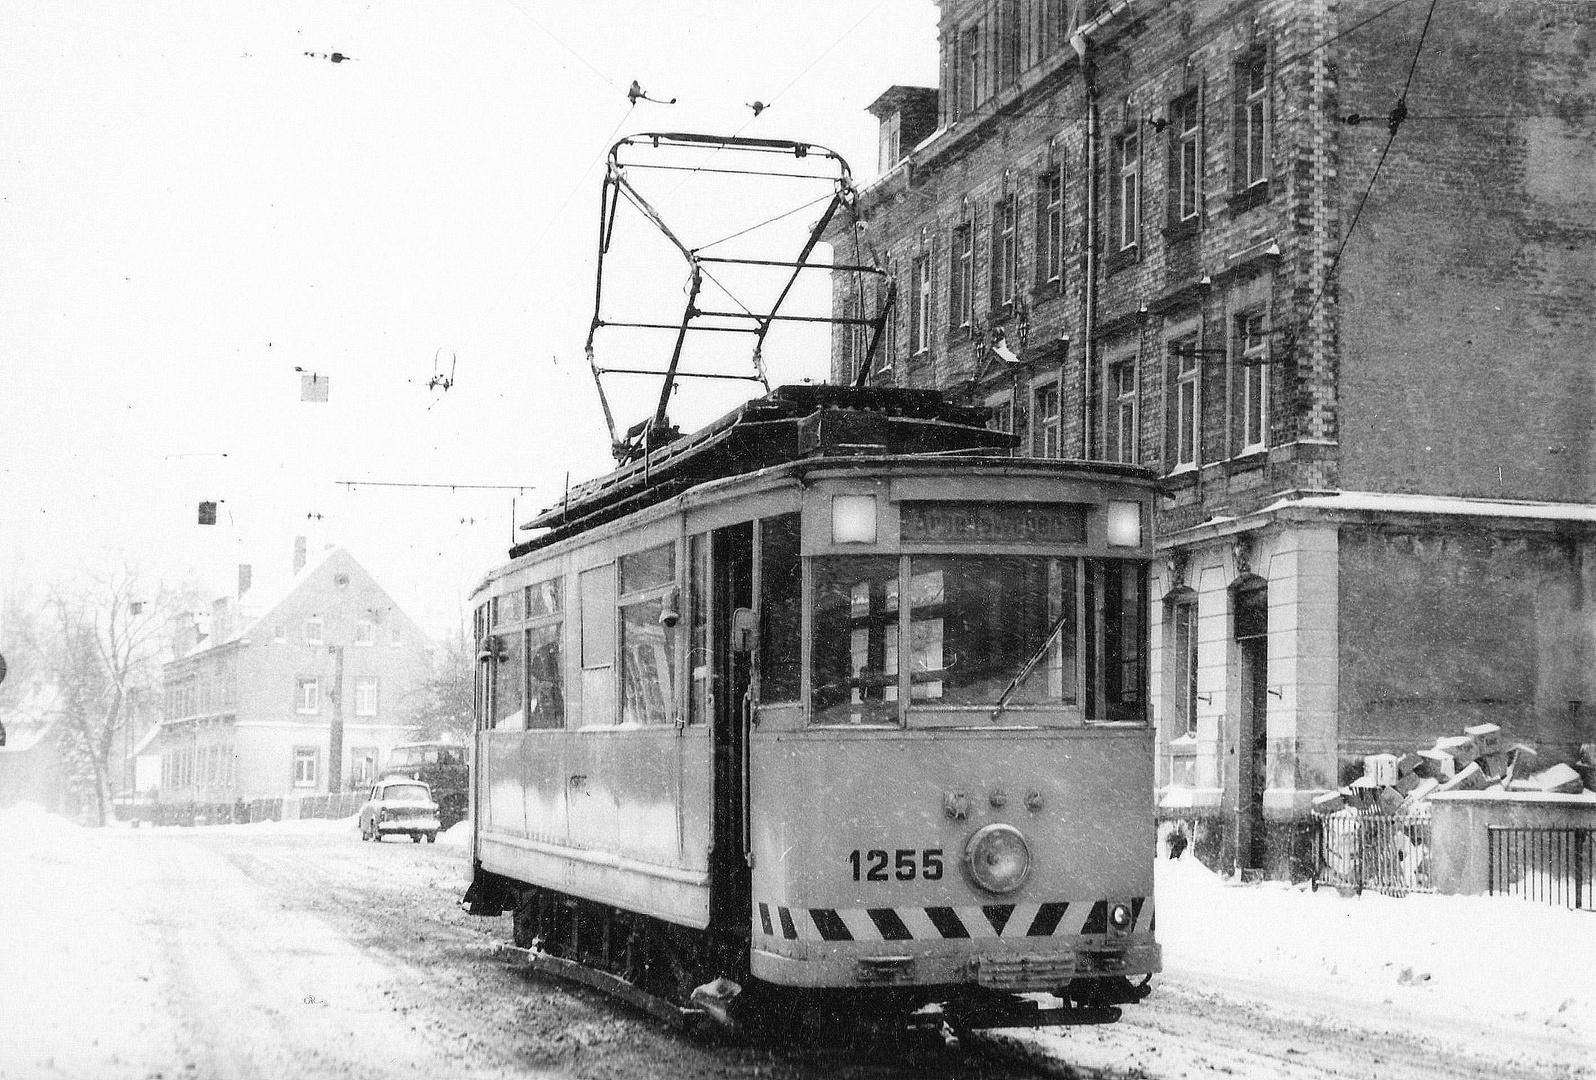 Karl Marx Stadt 1985 1255